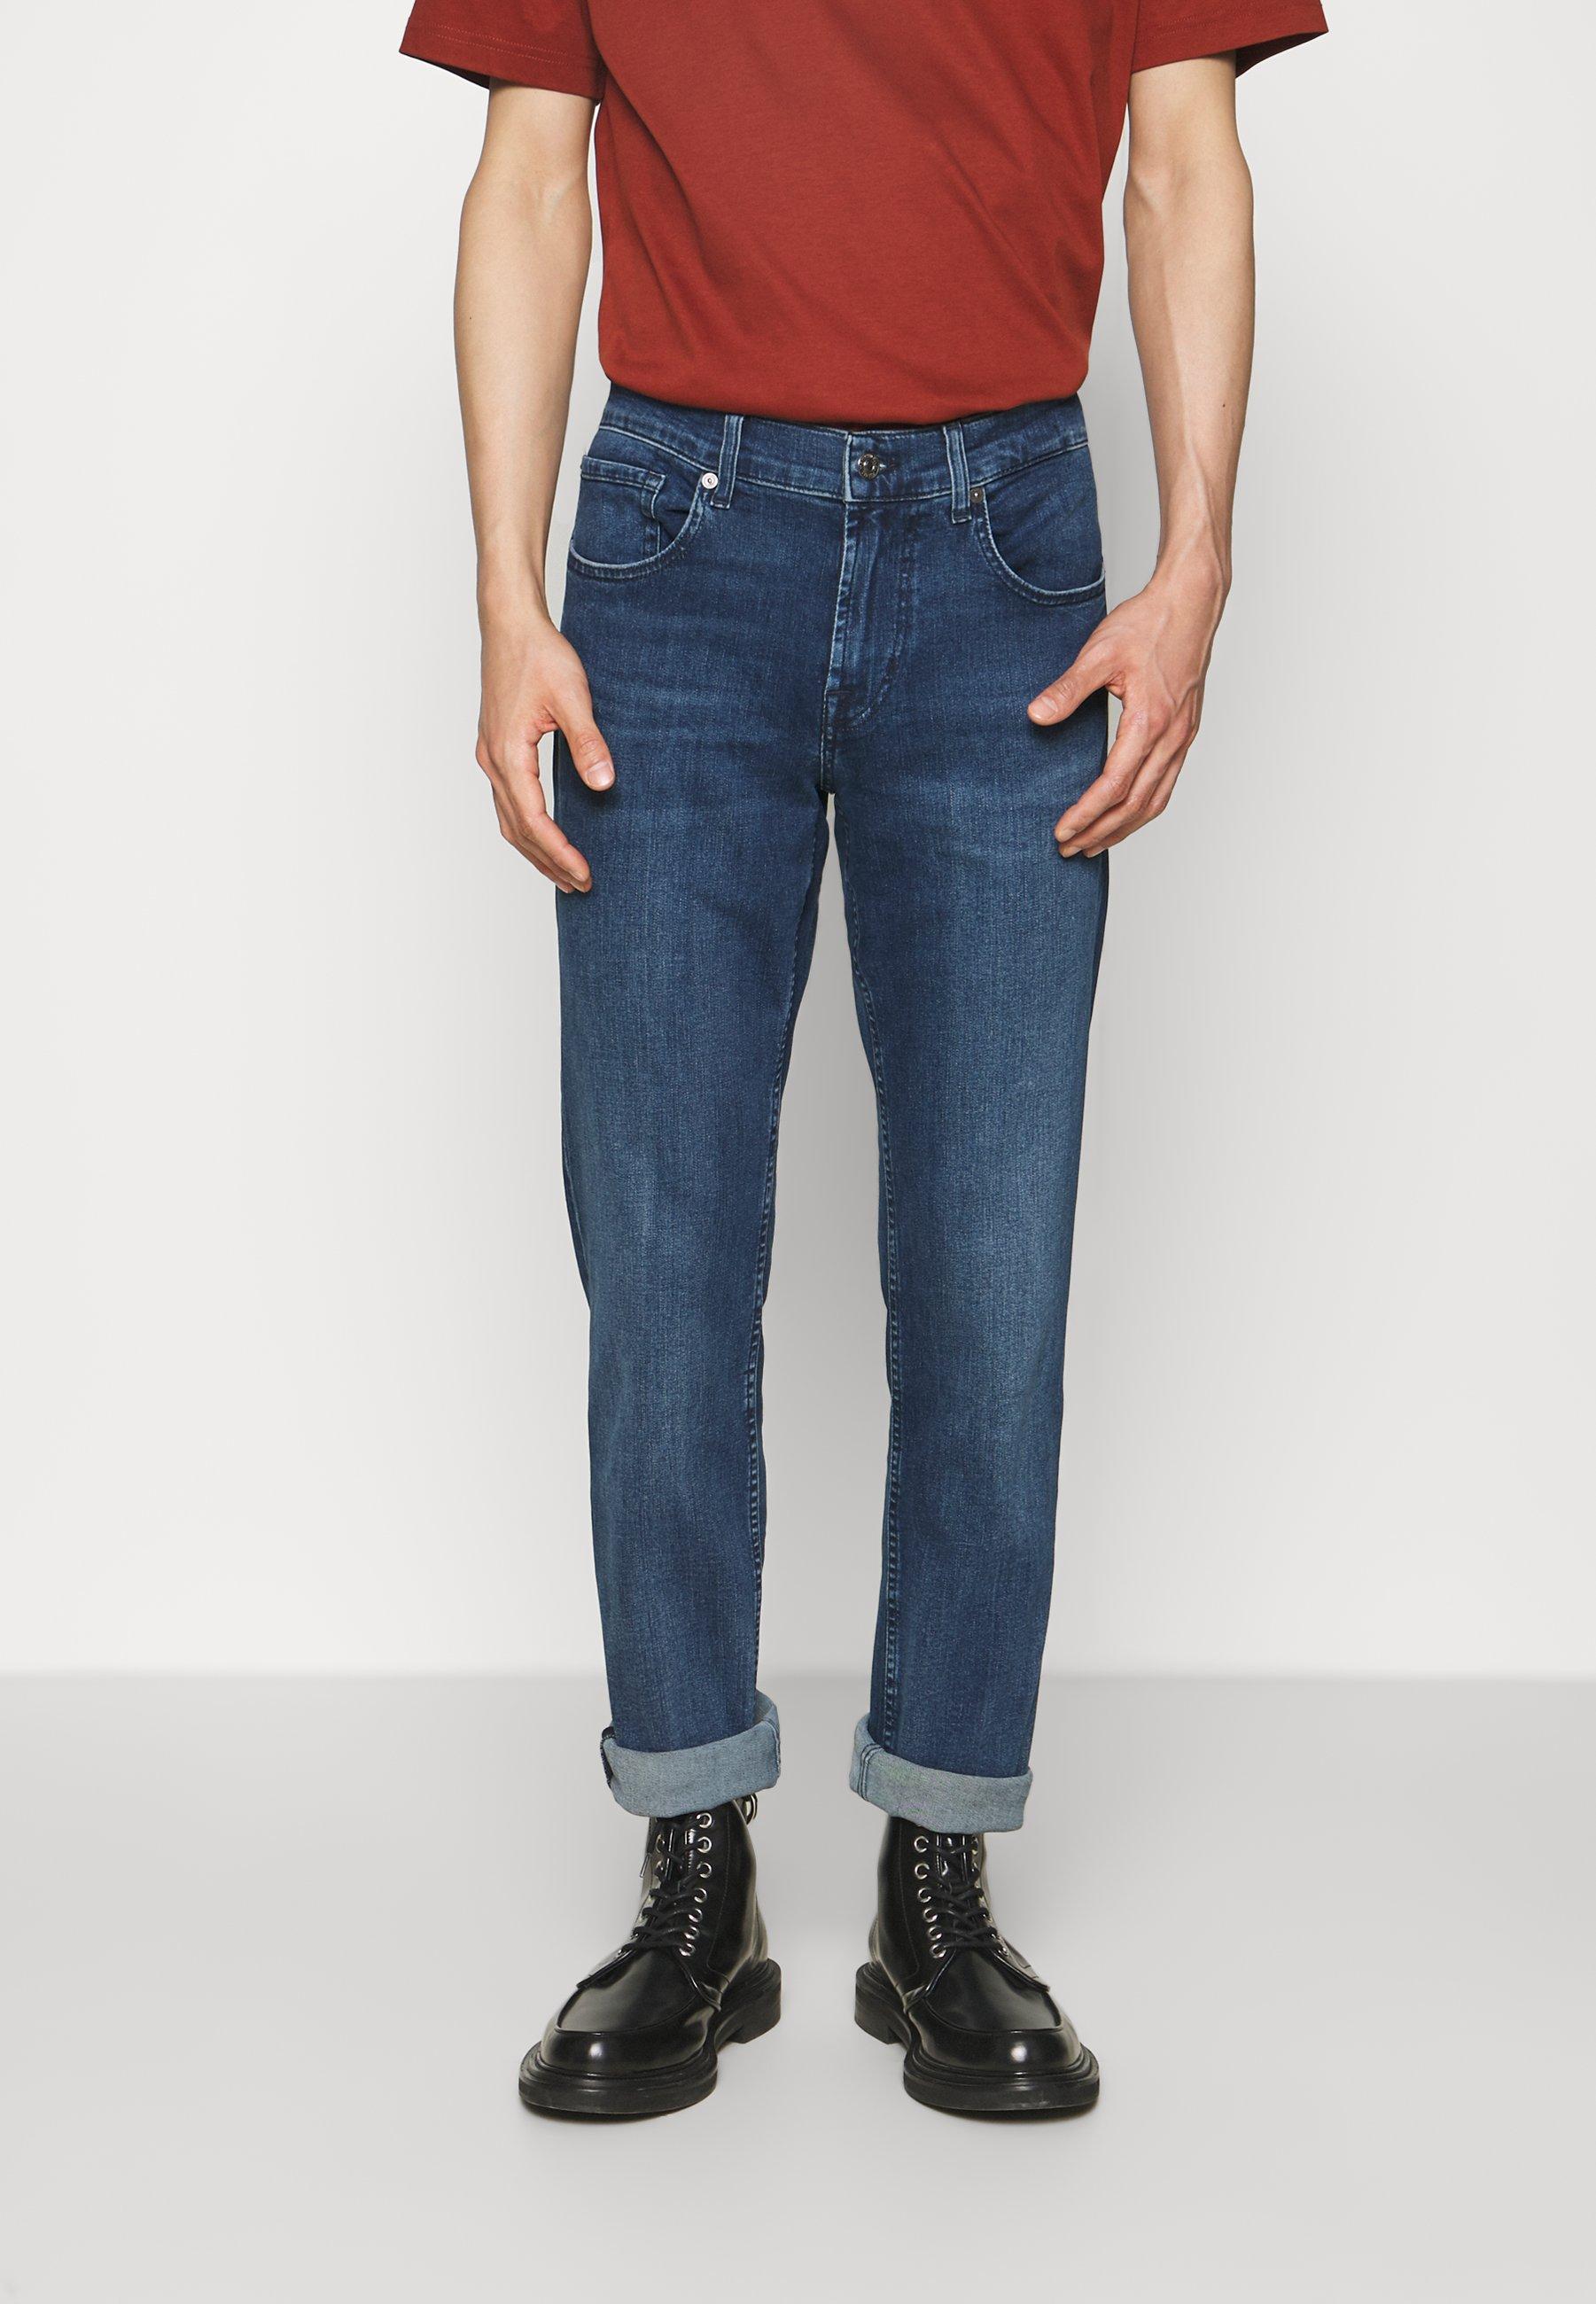 Uomo SLIMMY LEGEND - Jeans slim fit